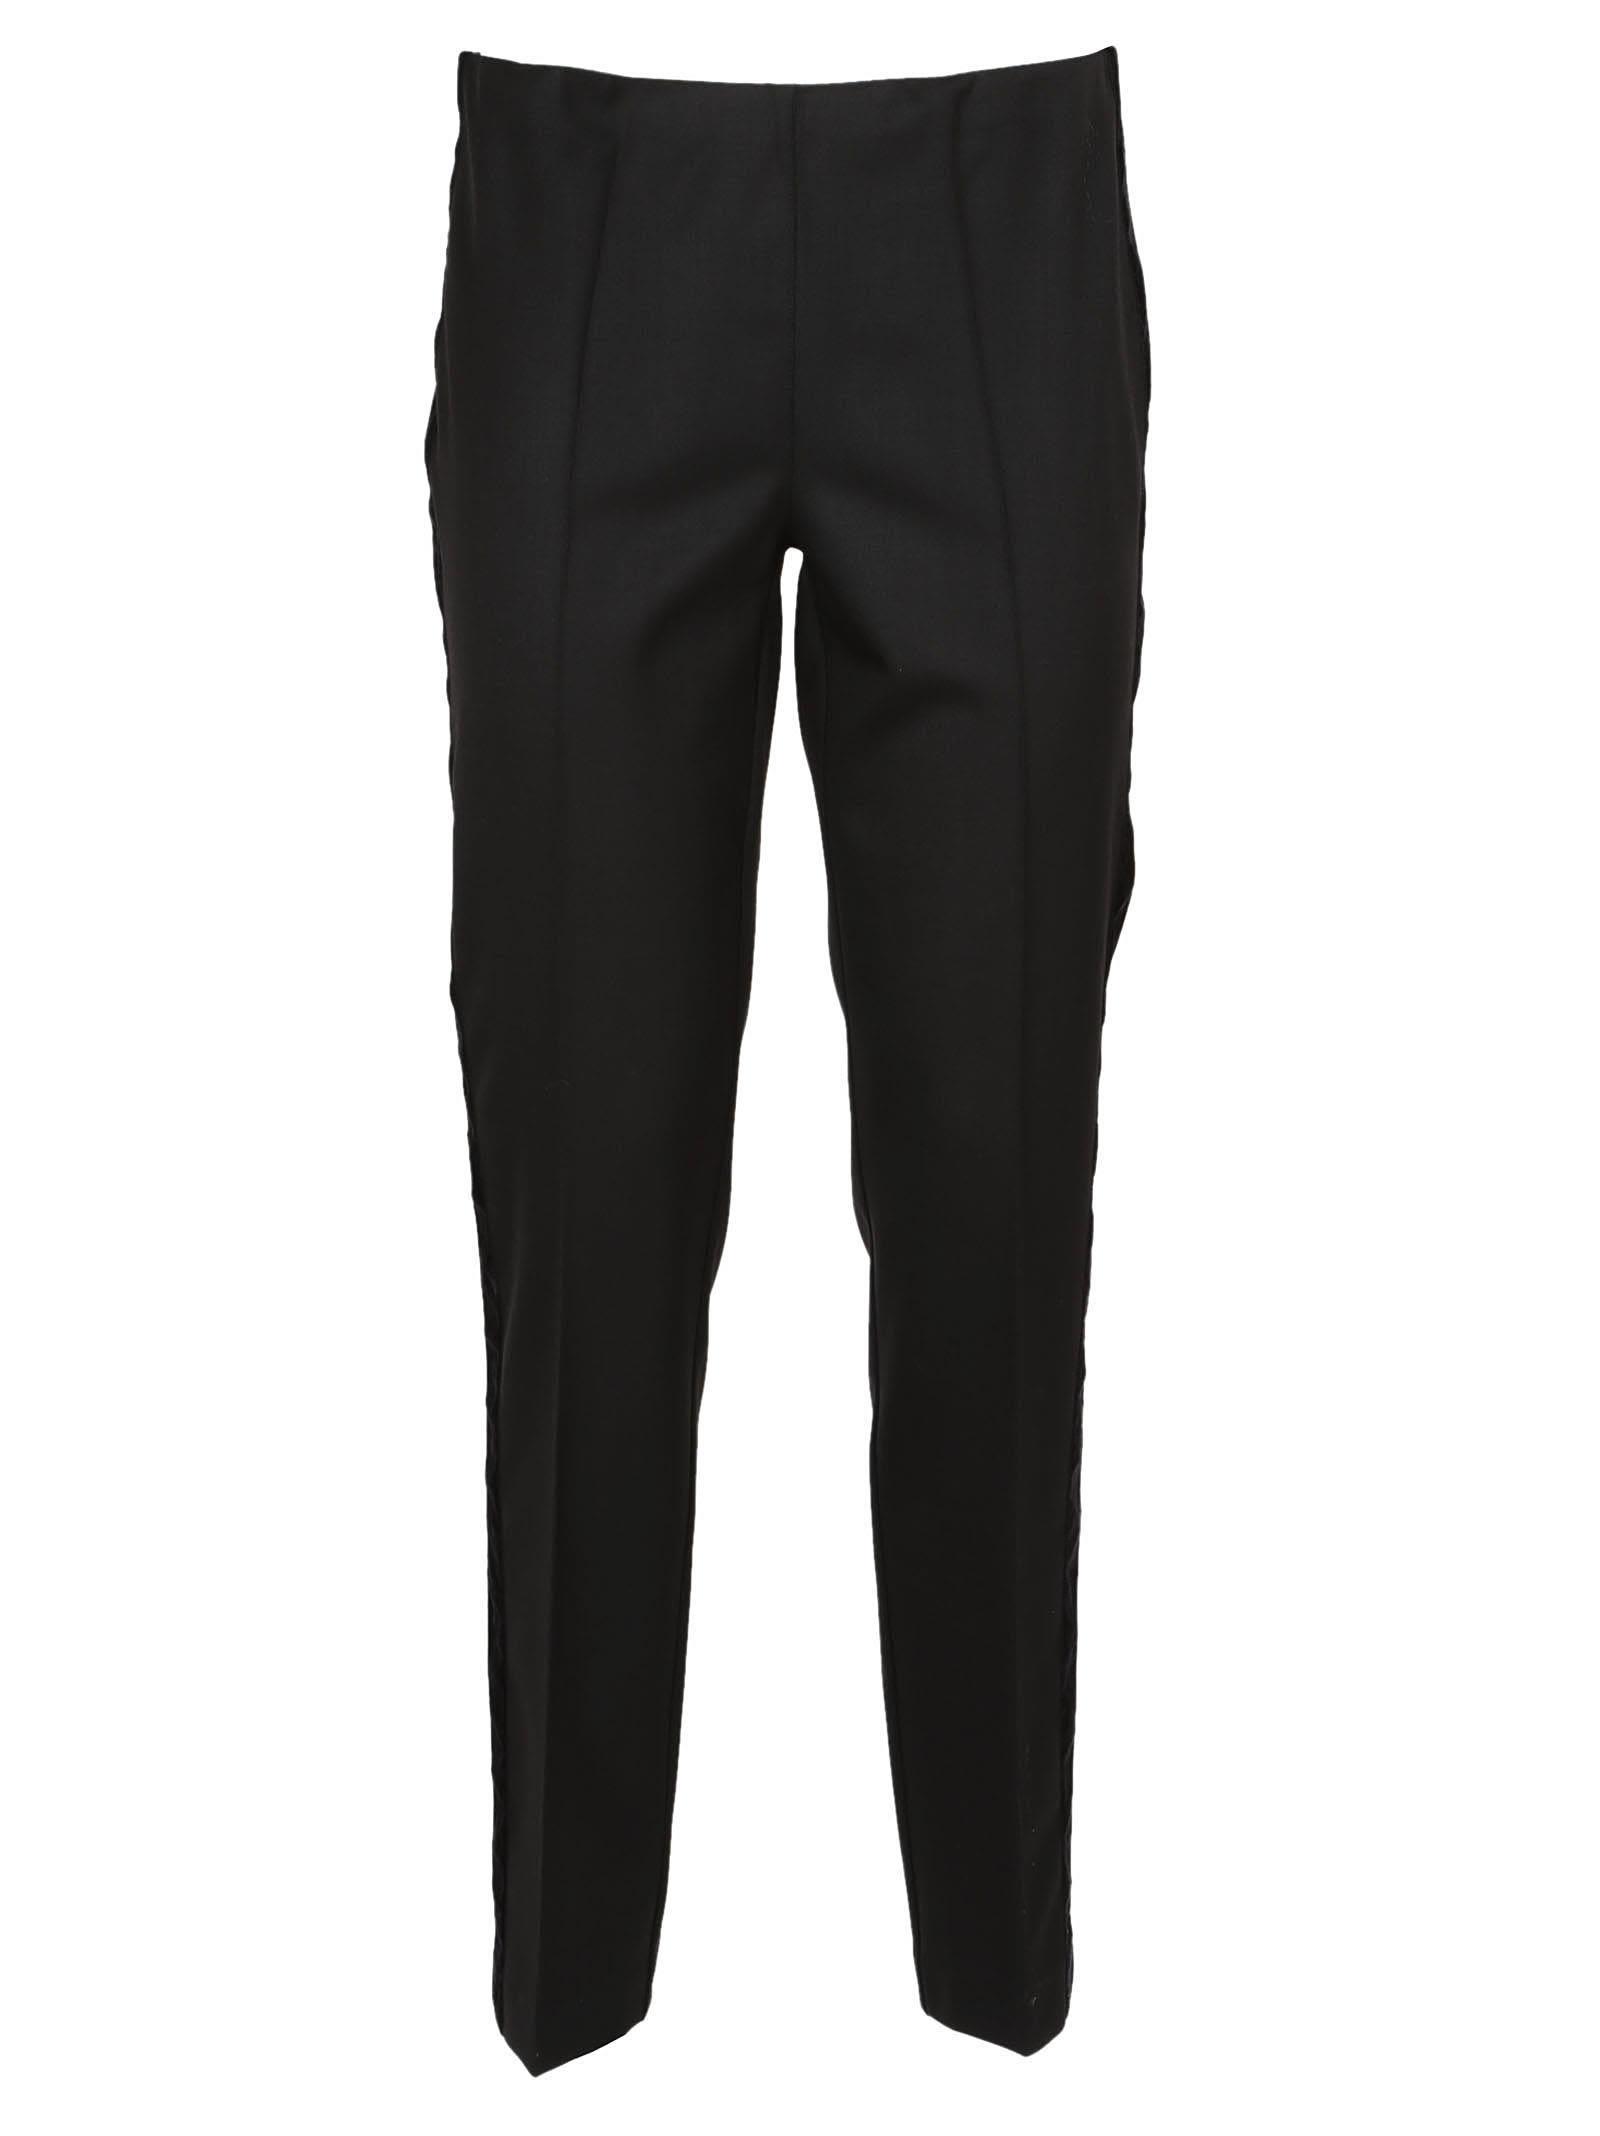 Parosh Lilu Trousers